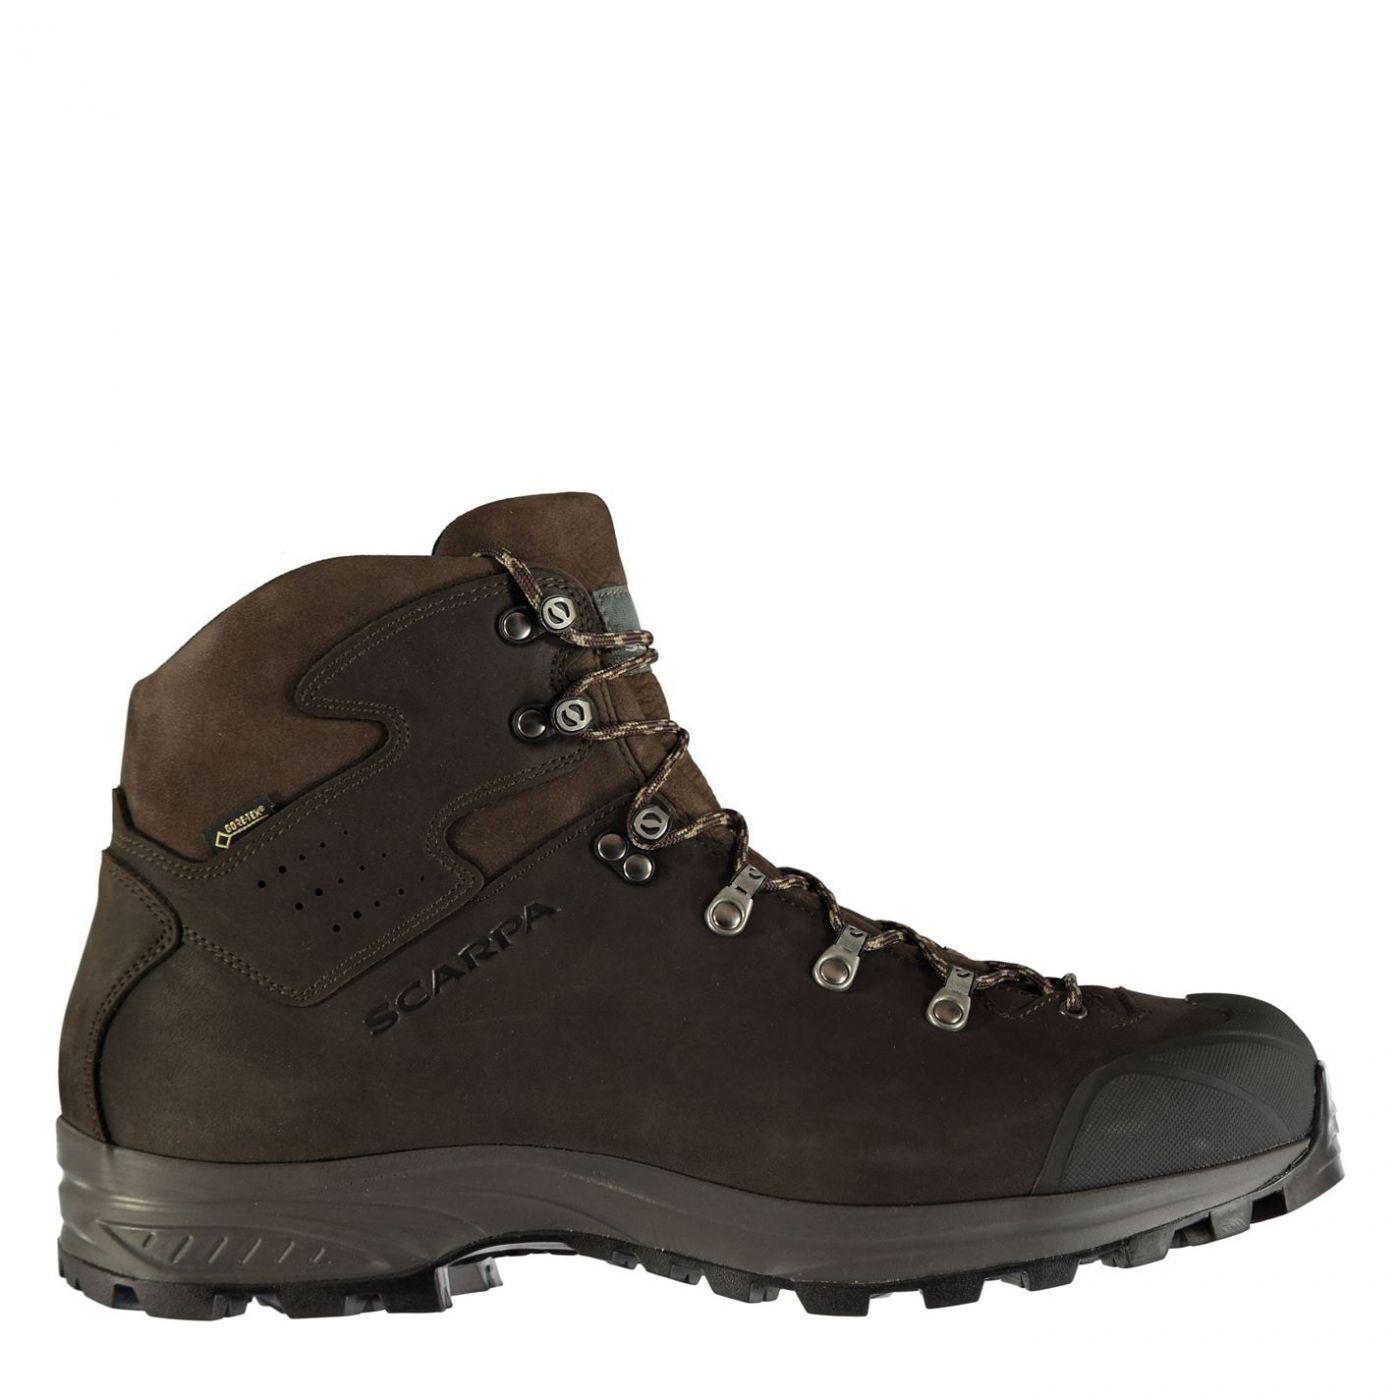 Scarpa Kailash Plus GTX Mens Walking Boots